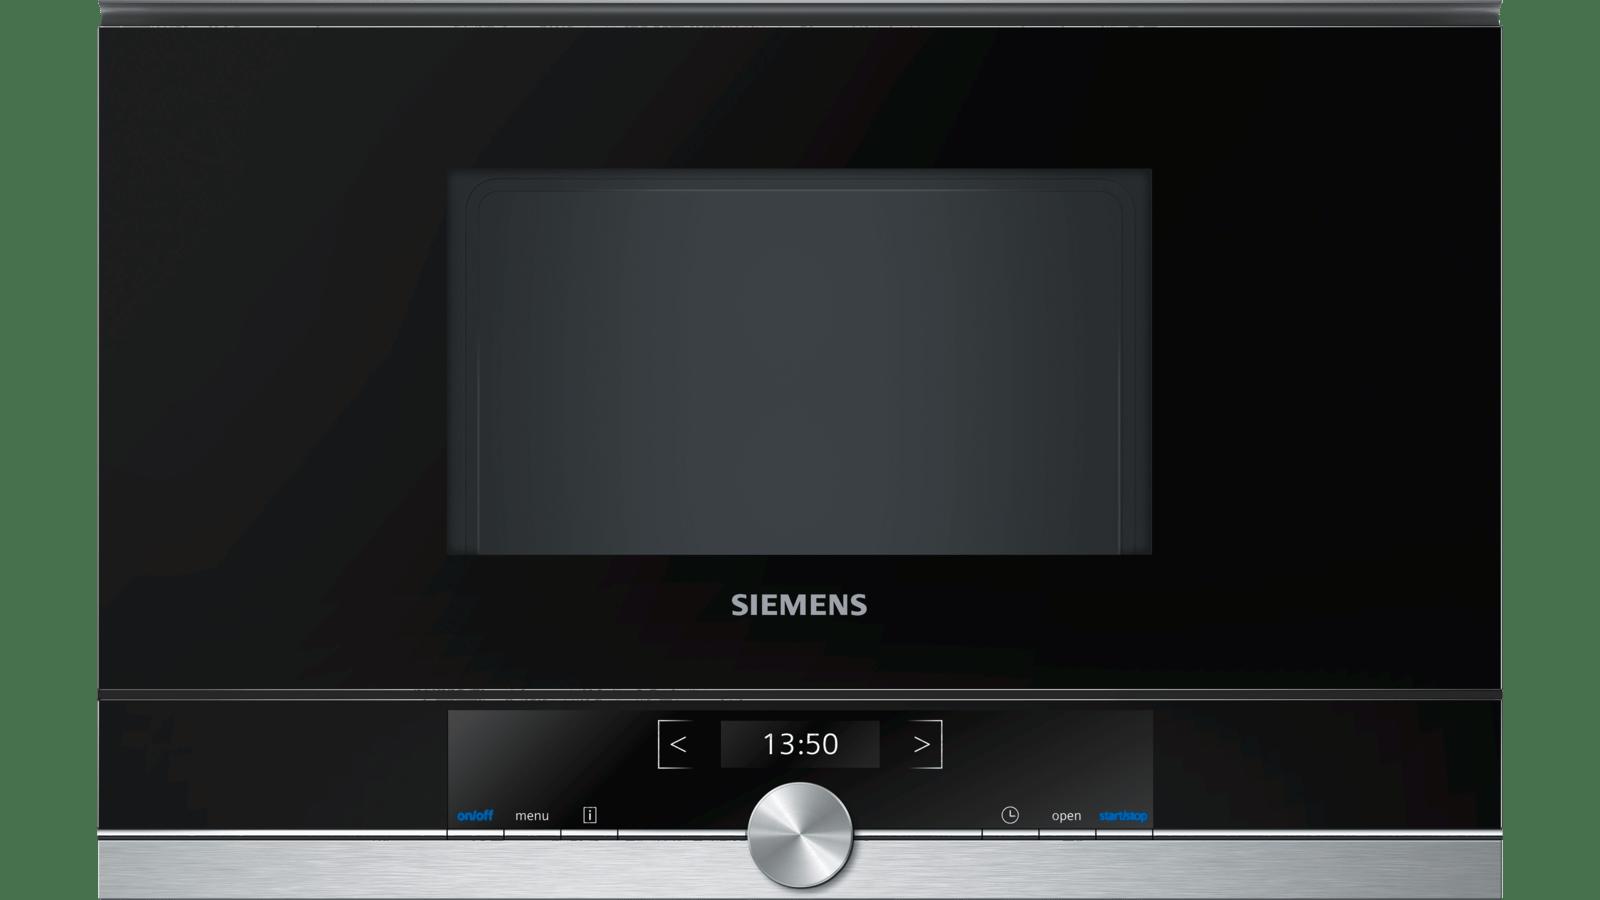 SIEMENS BF634RGS1 Einbau Mikrowelle